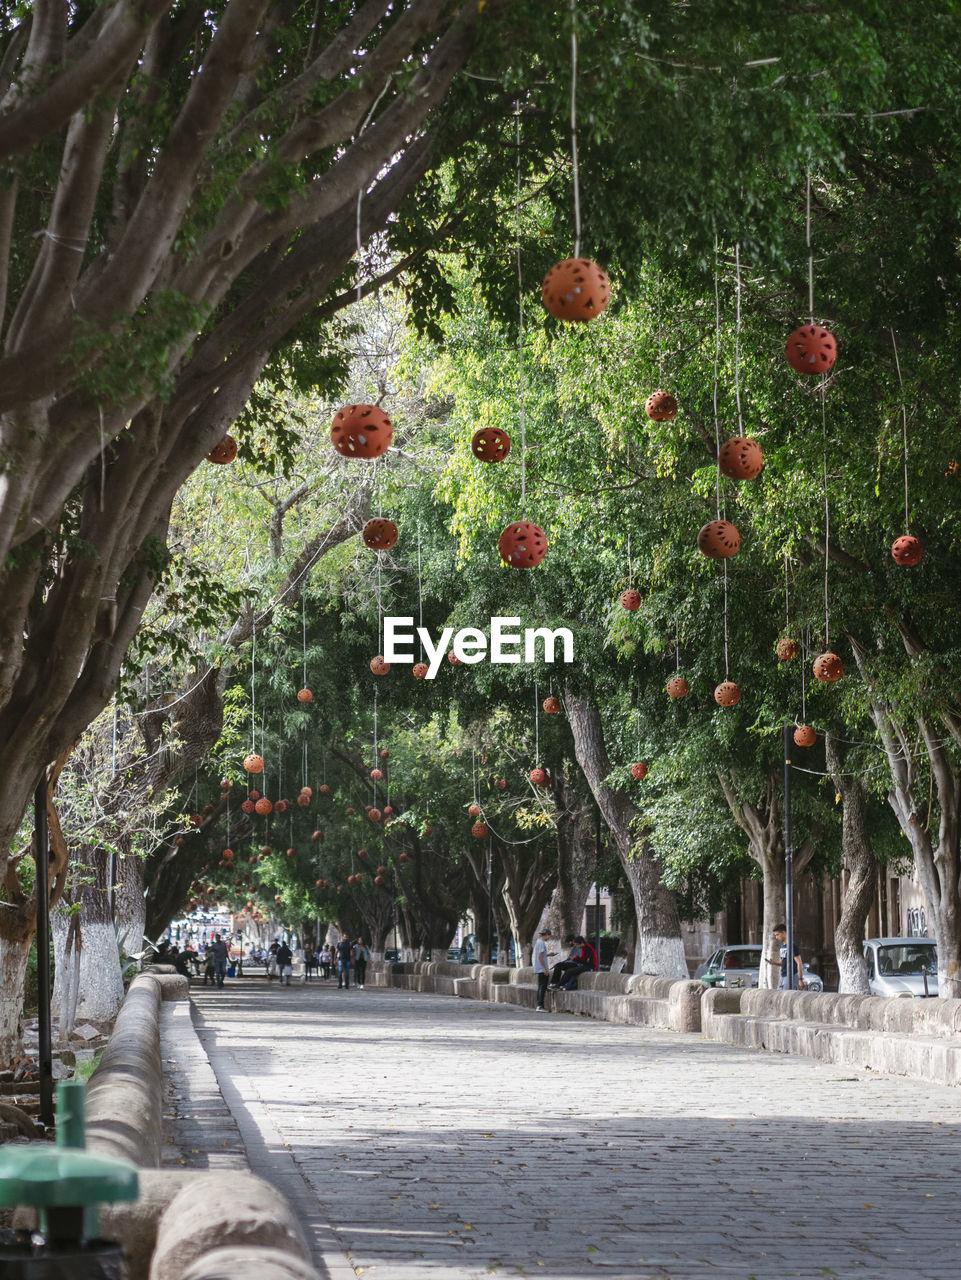 VIEW OF FRUIT TREE